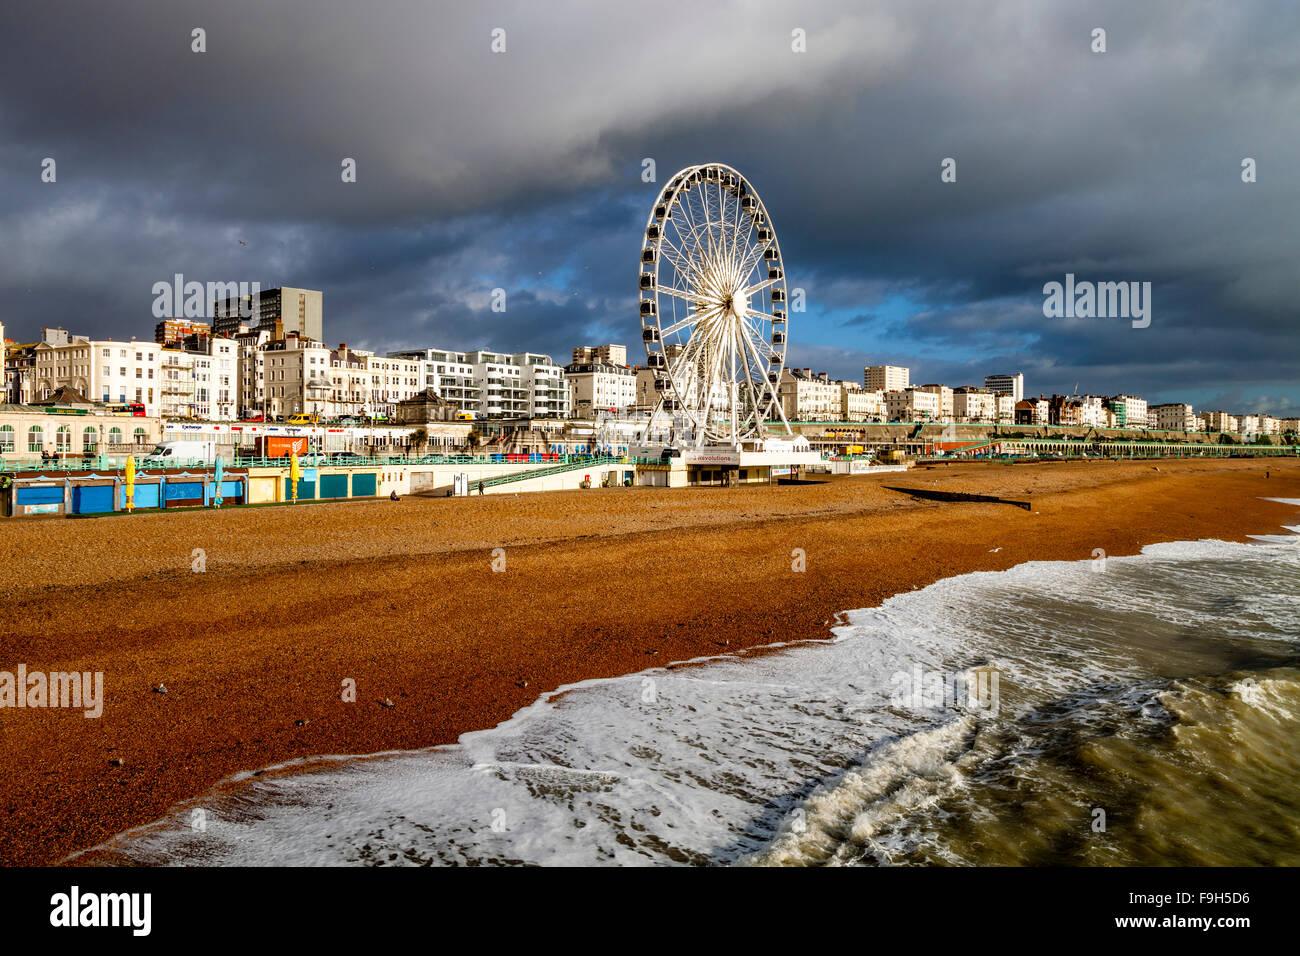 Le front de mer, Brighton, Sussex, UK Photo Stock